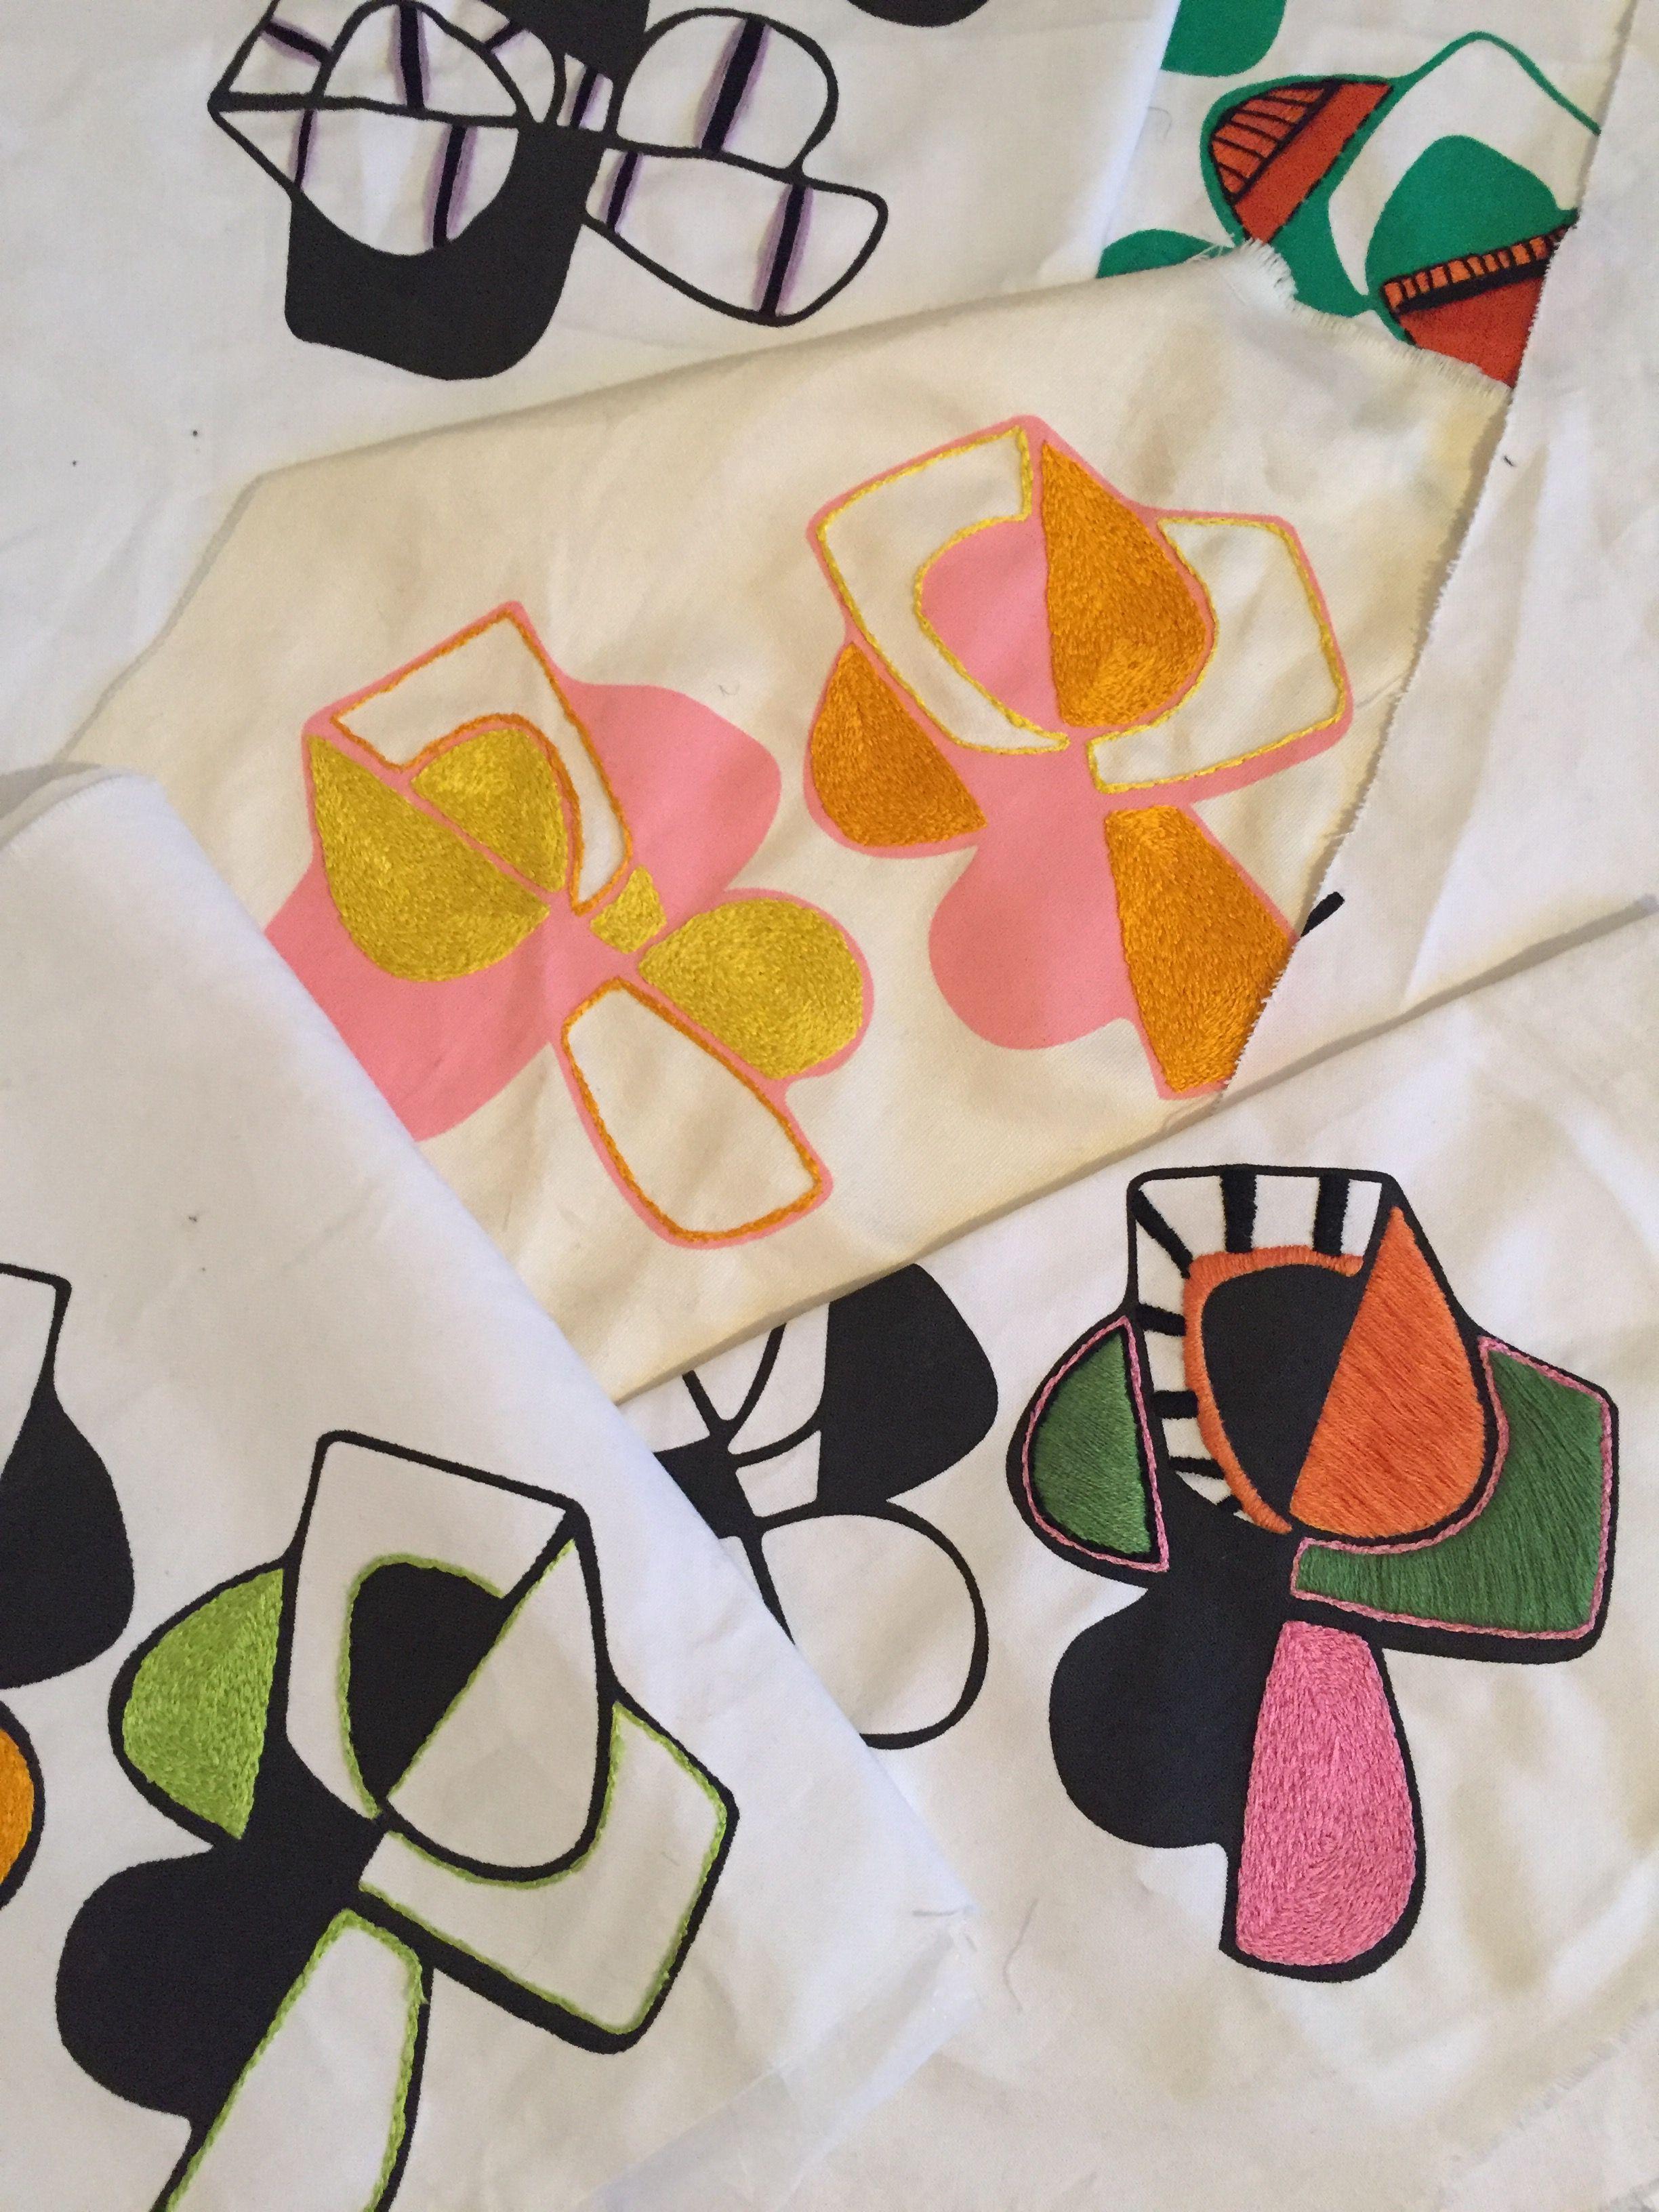 37ff2ce9751c3 Embroidery and screen printed samples by textiles designer Rebeckah Kemi  Apara.